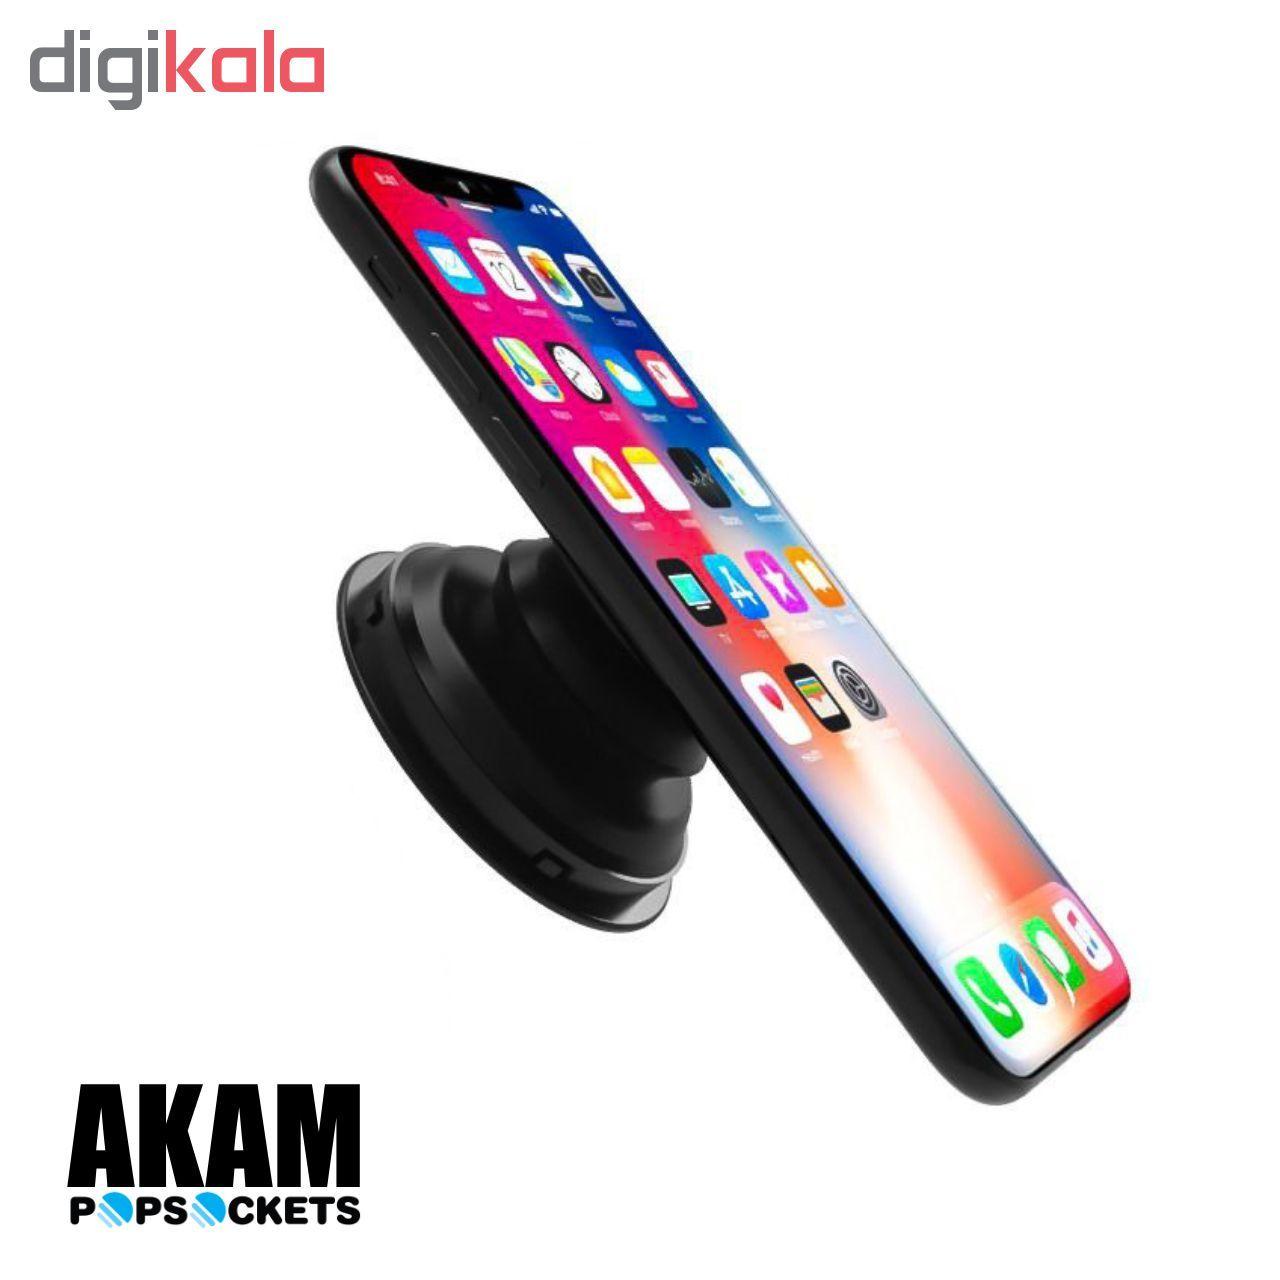 پایه نگهدارنده گوشی موبایل پاپ سوکت آکام مدل APS0078 main 1 7